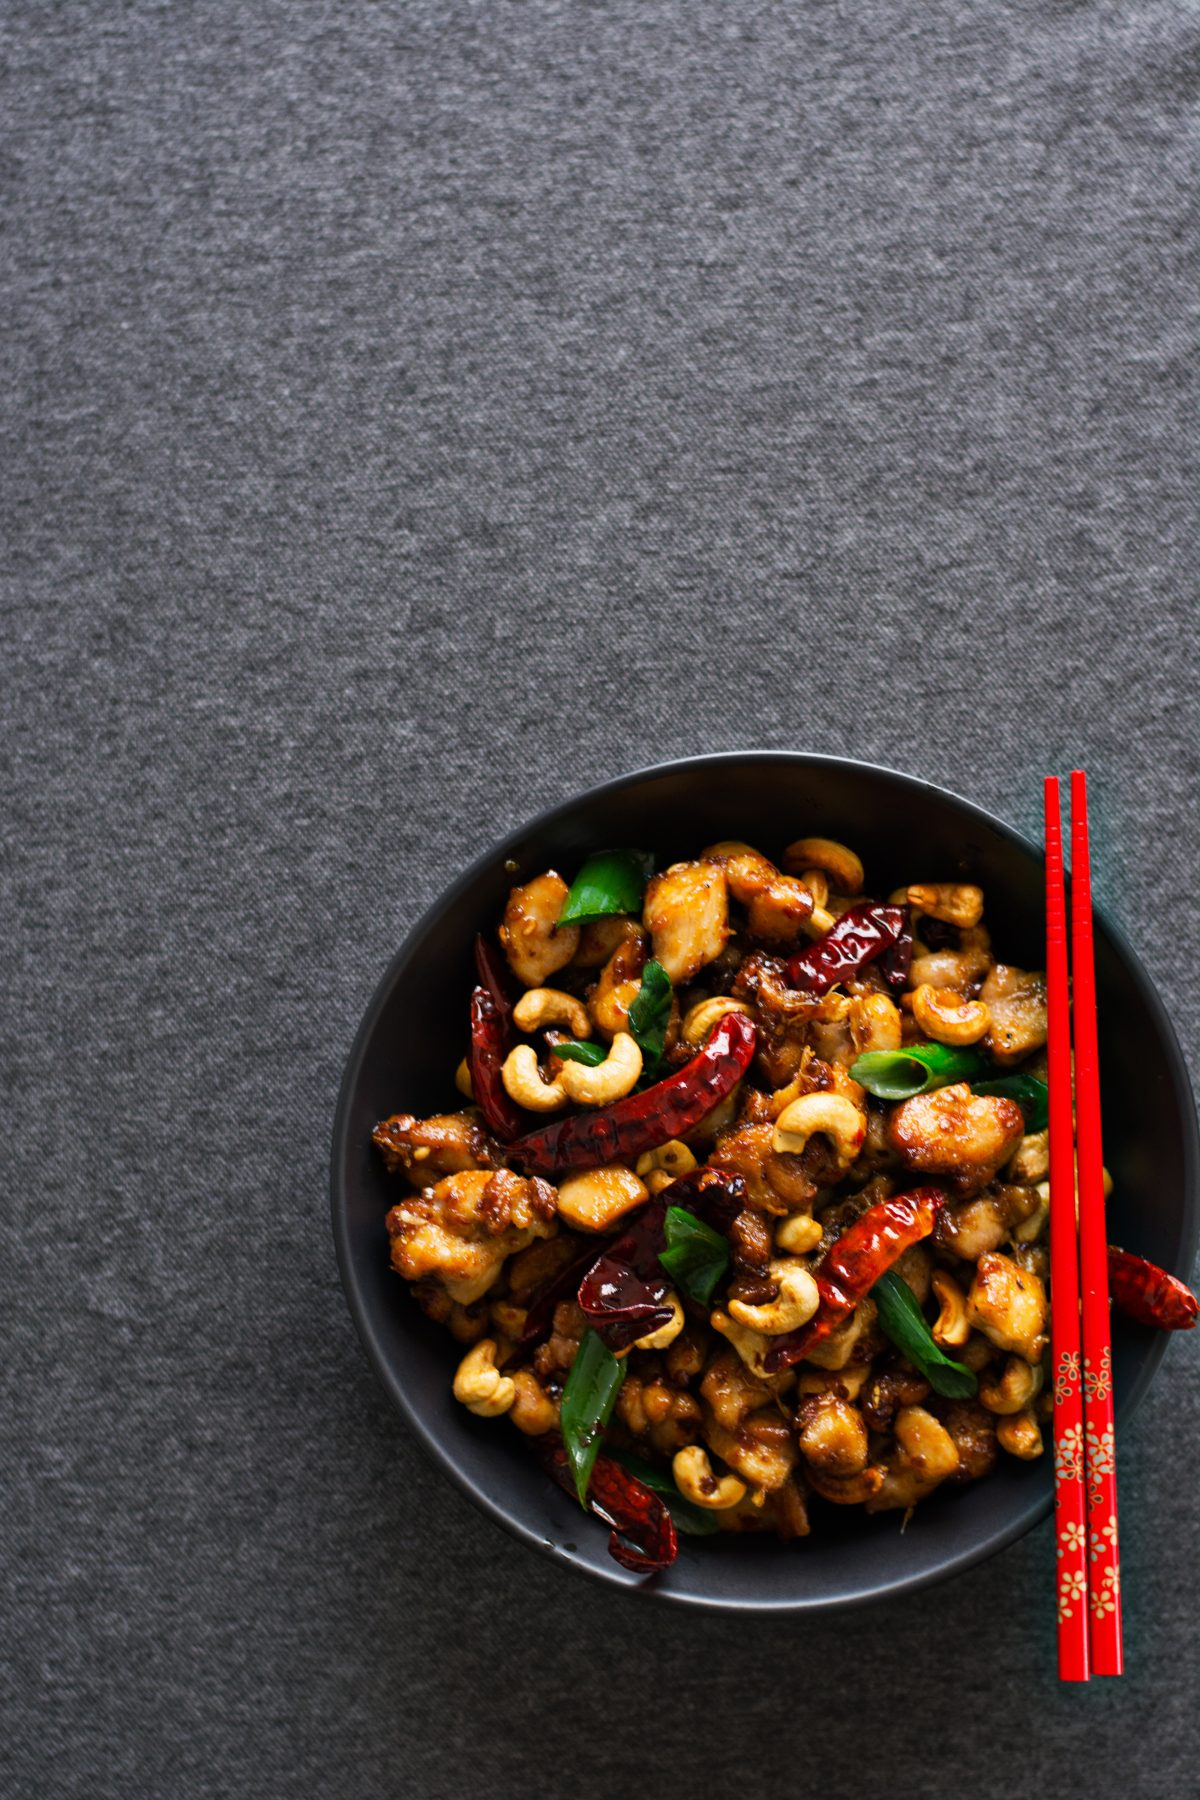 Stir Fried Chicken with Sichuan Peppercorns, Chillies and Cashews - thespiceadventuress.com